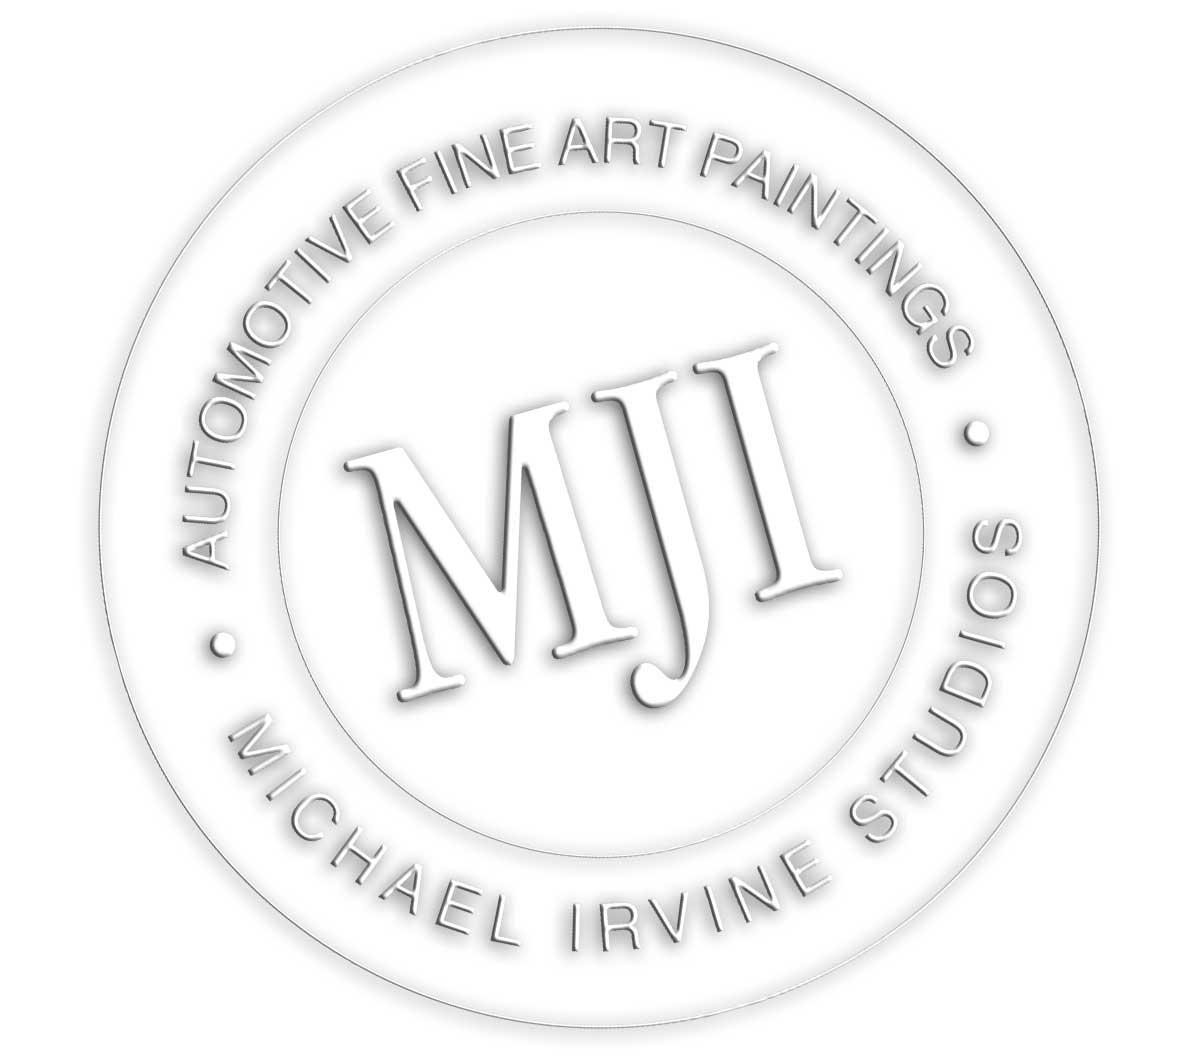 Michael Irvine Studios Seal